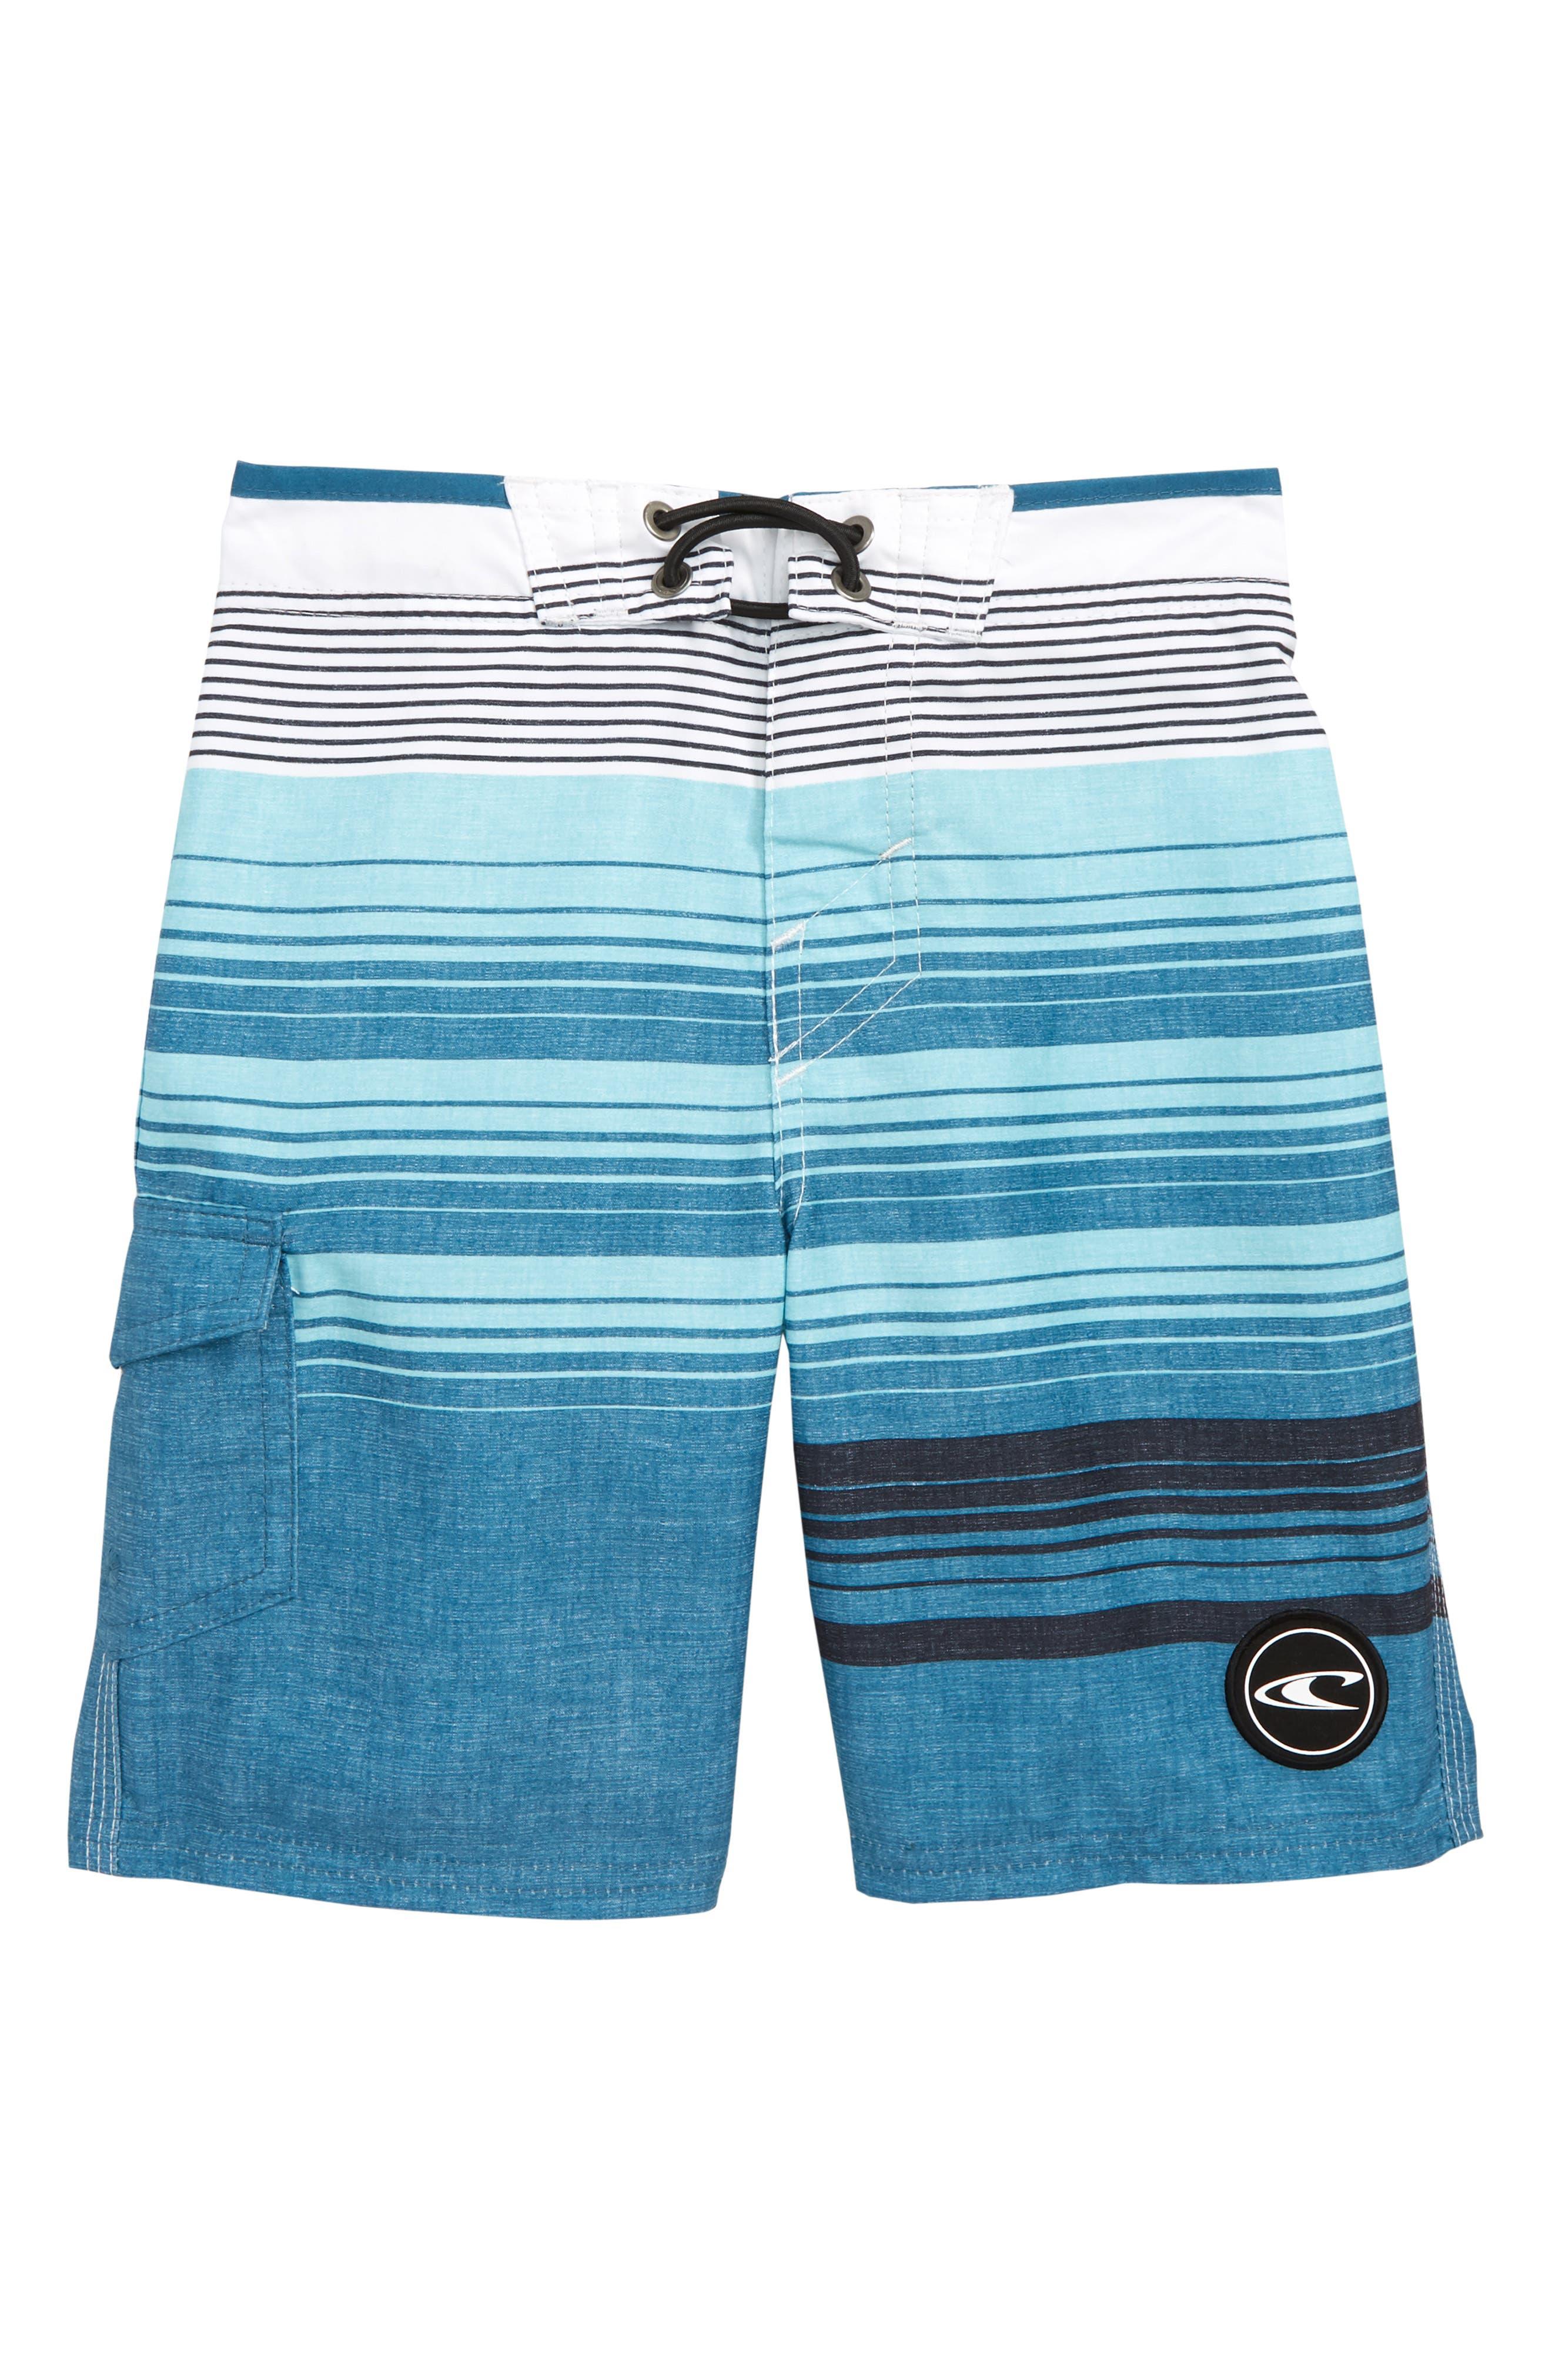 Bennett Board Shorts,                         Main,                         color, Aqua